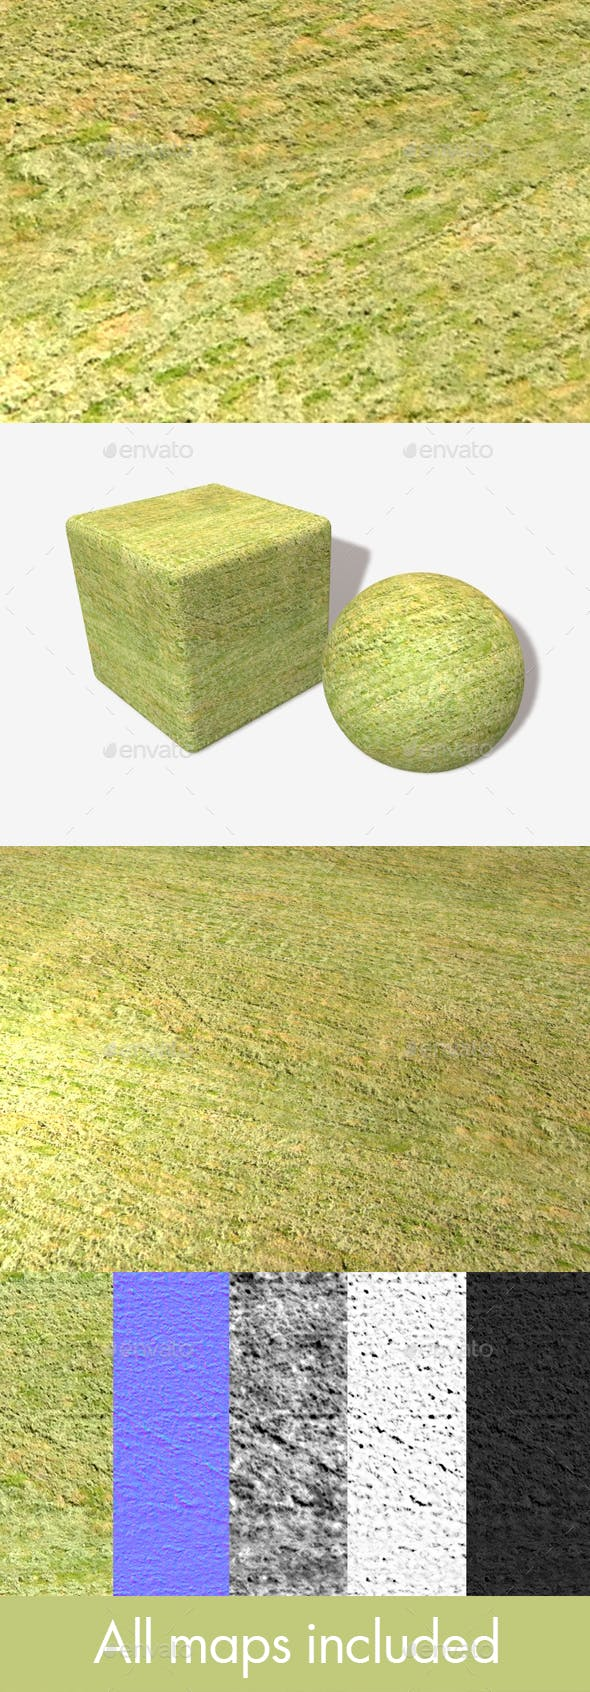 High Angle Cut Grass Field Seamless Texture - 3DOcean Item for Sale